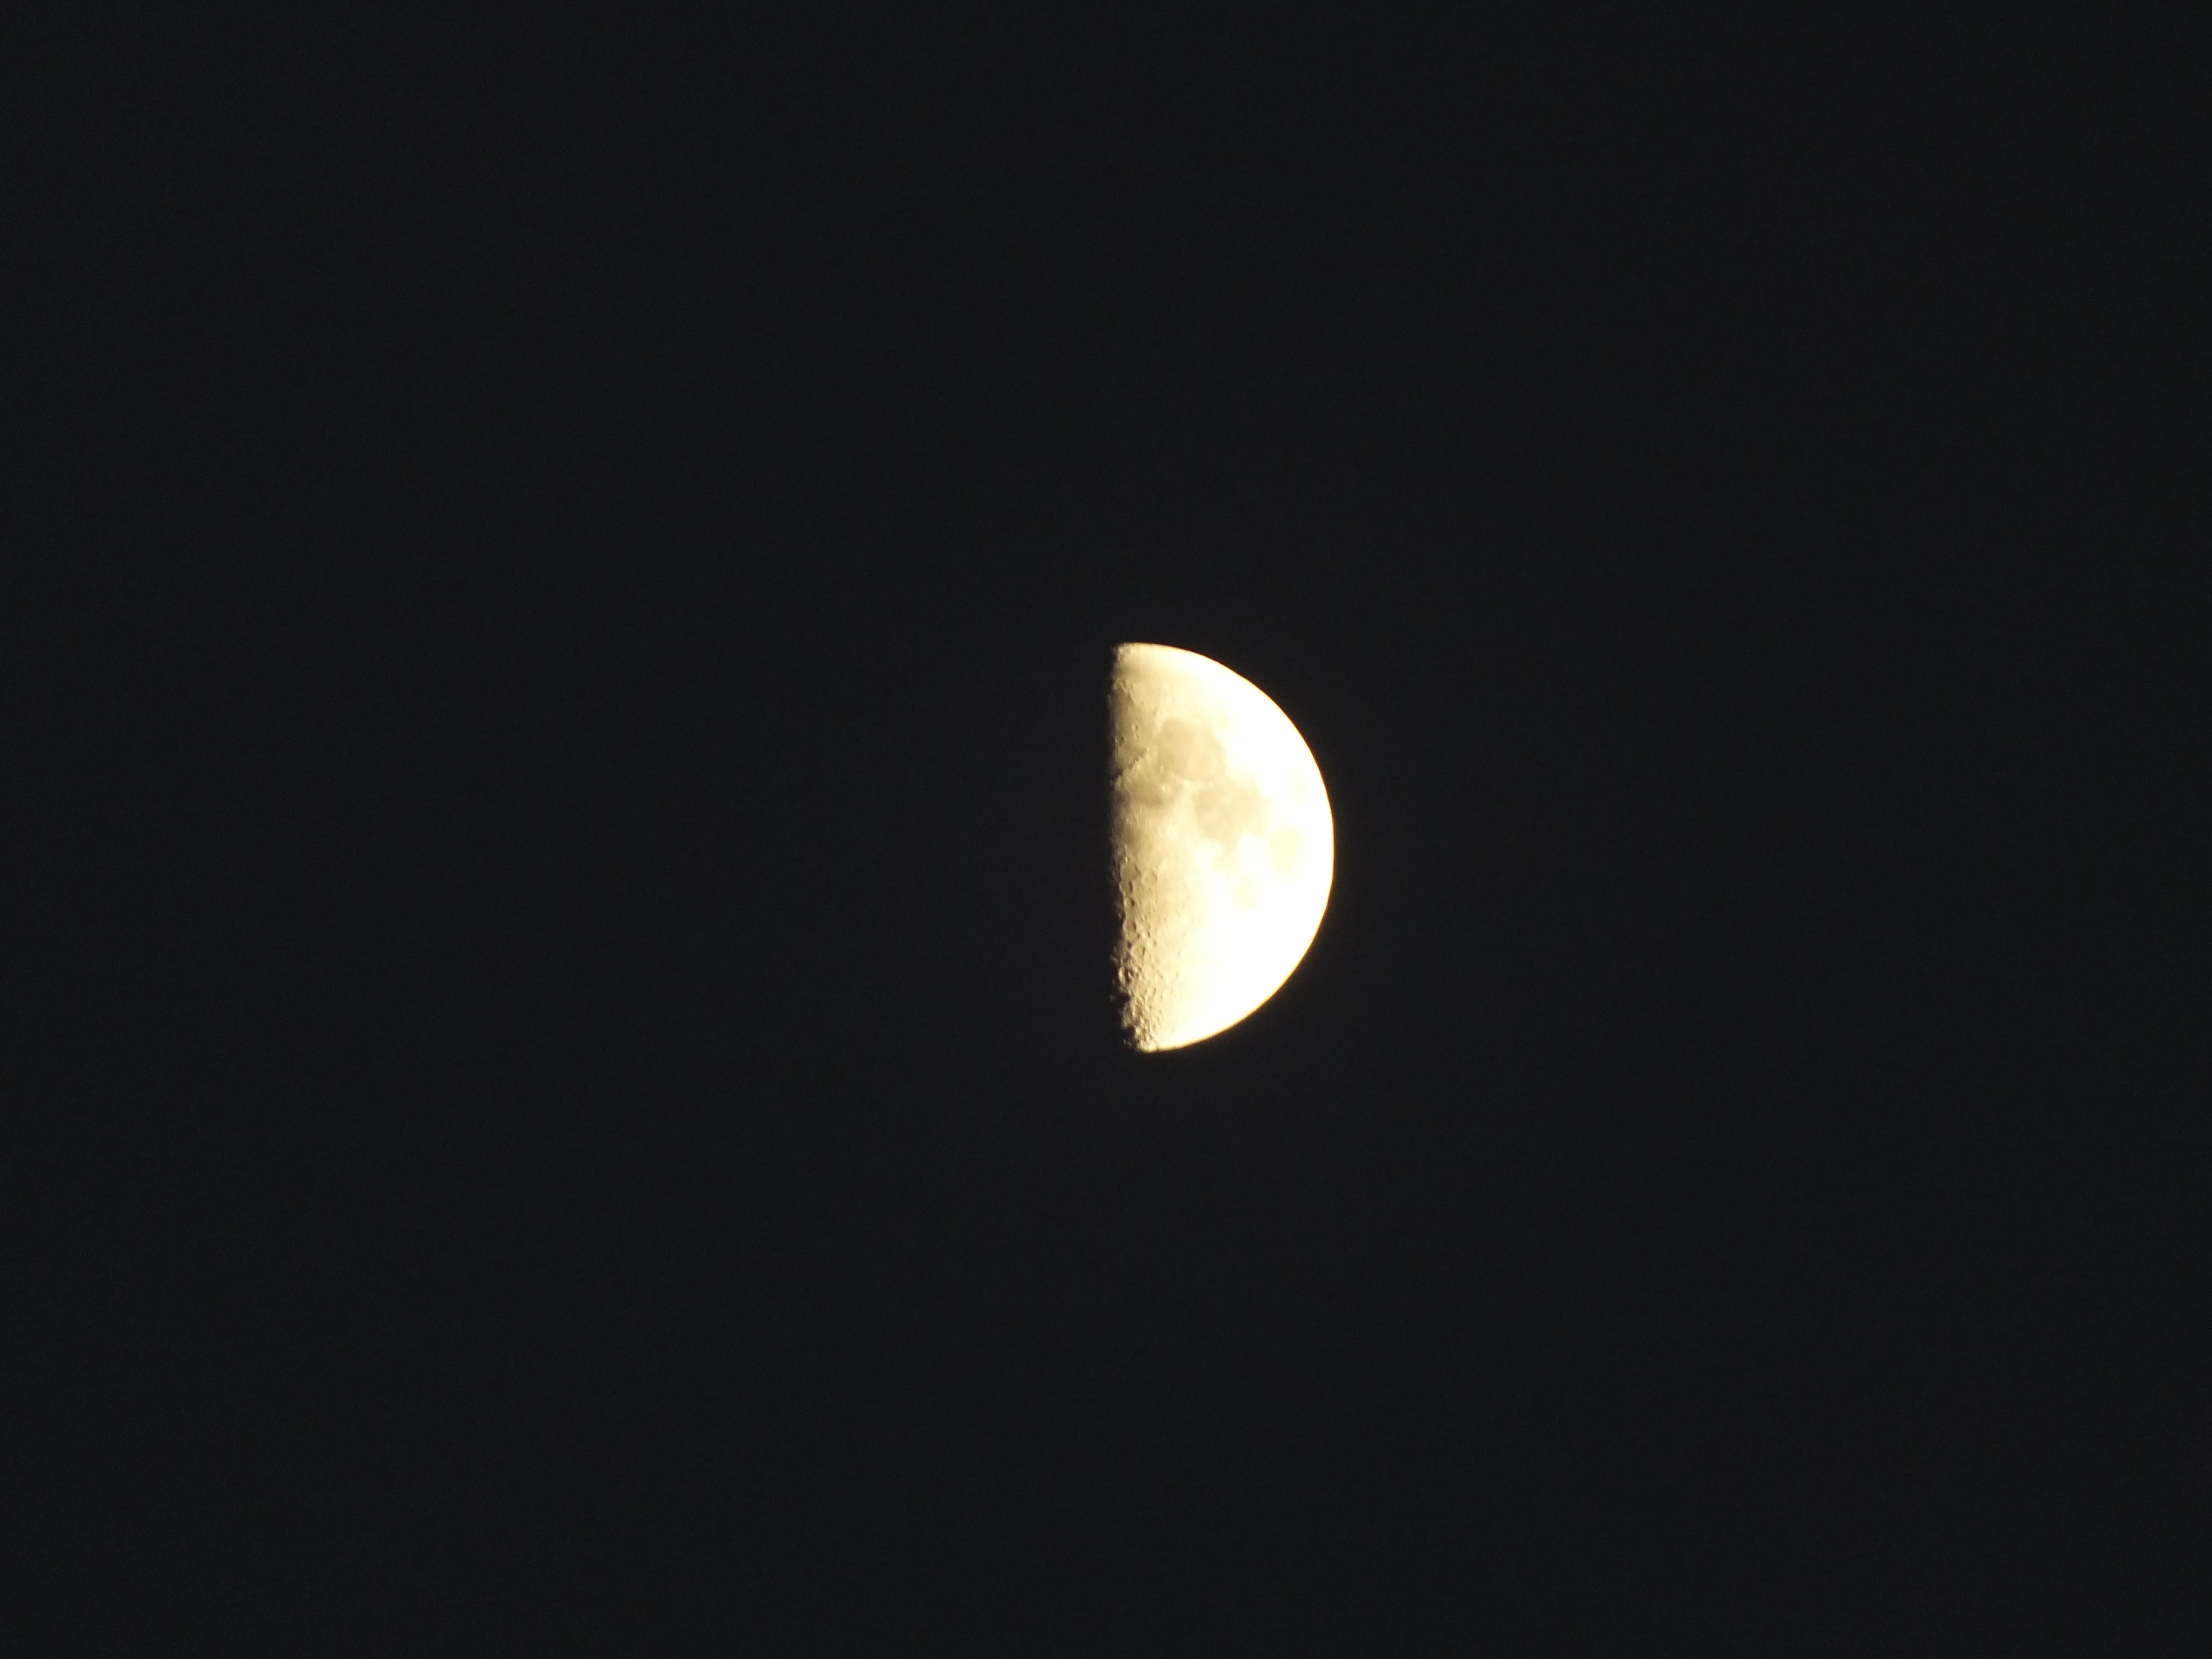 Moon, Black, Lunar, Planet, Sky, HQ Photo